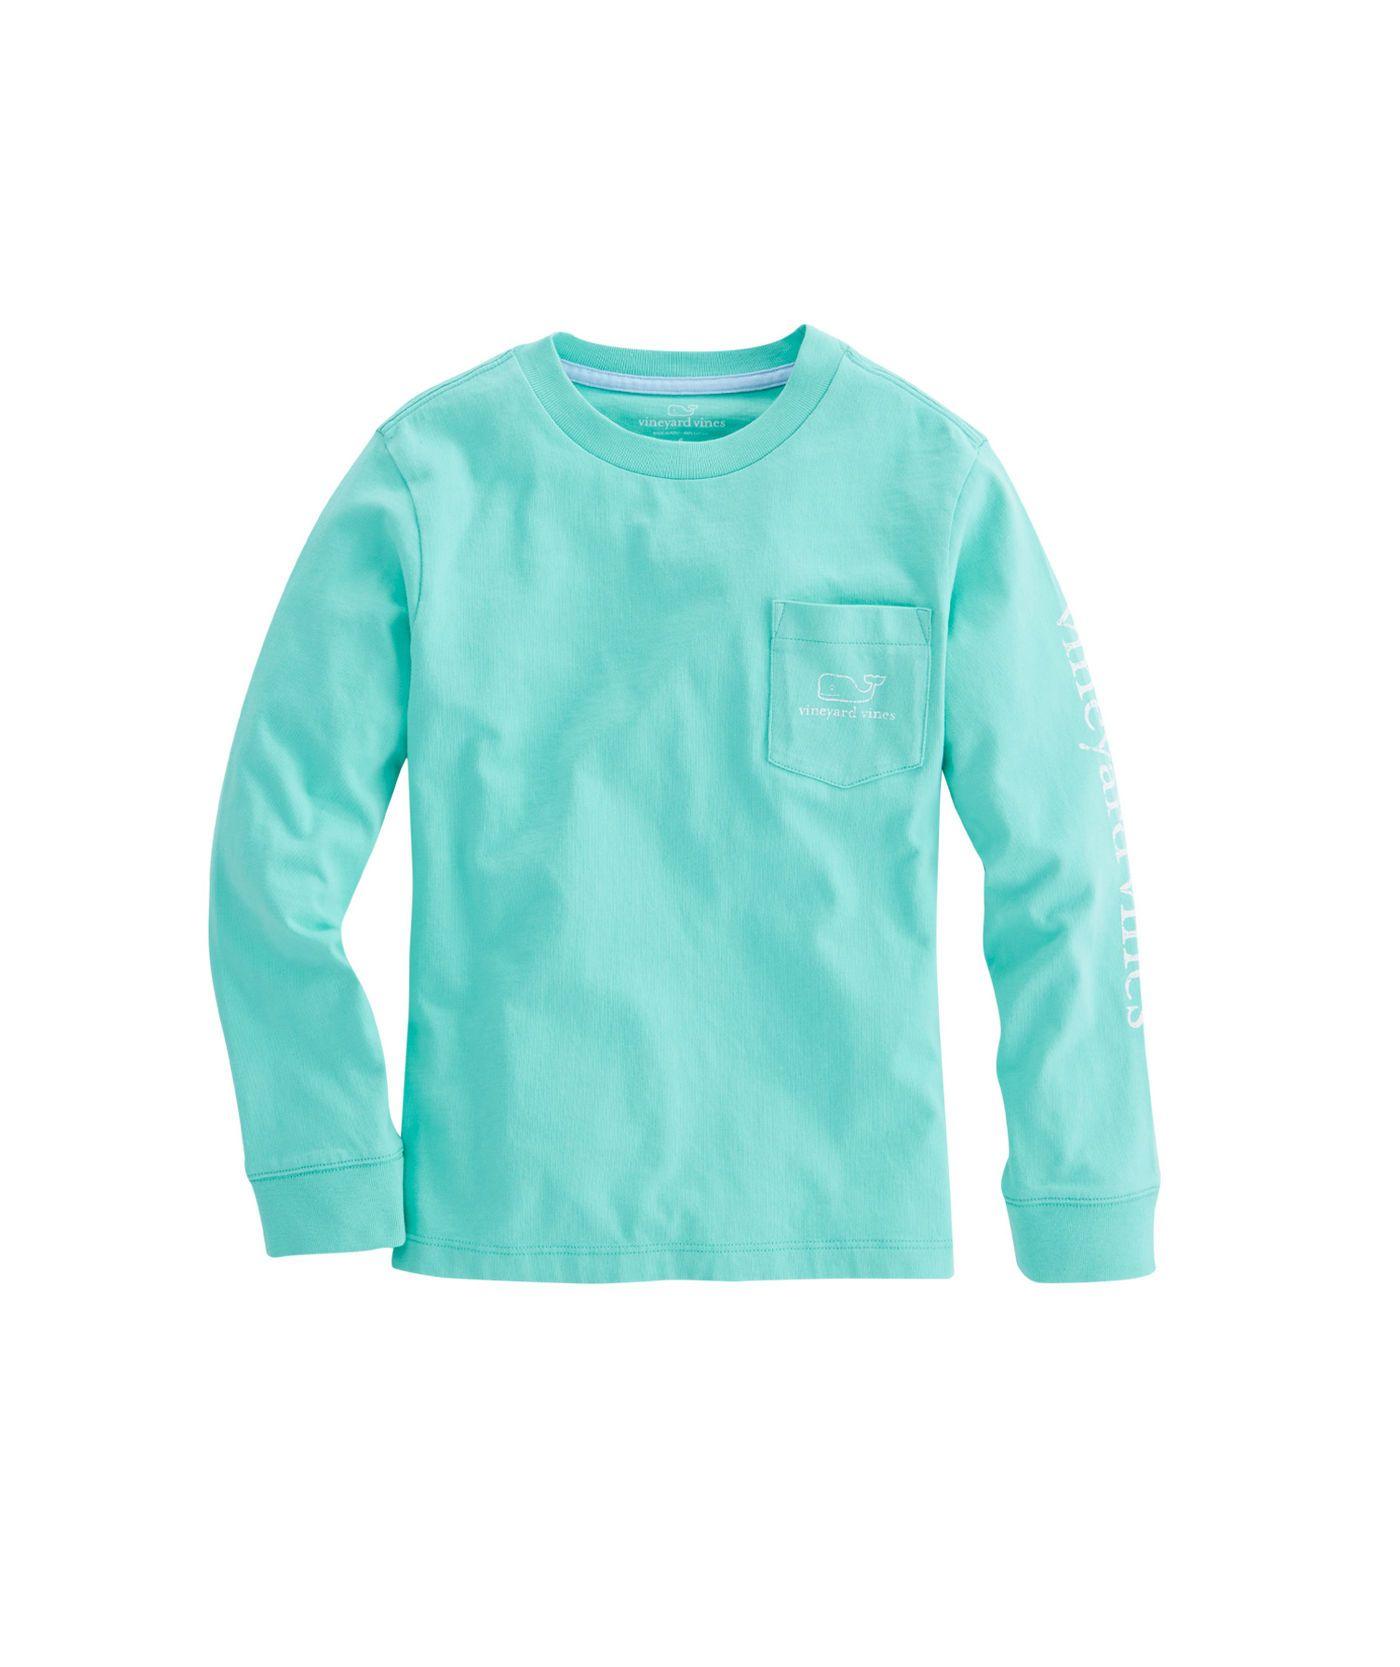 2f78ed529 Vineyard Vines Kids Long-Sleeve Vintage Whale Graphic T-Shirt ...